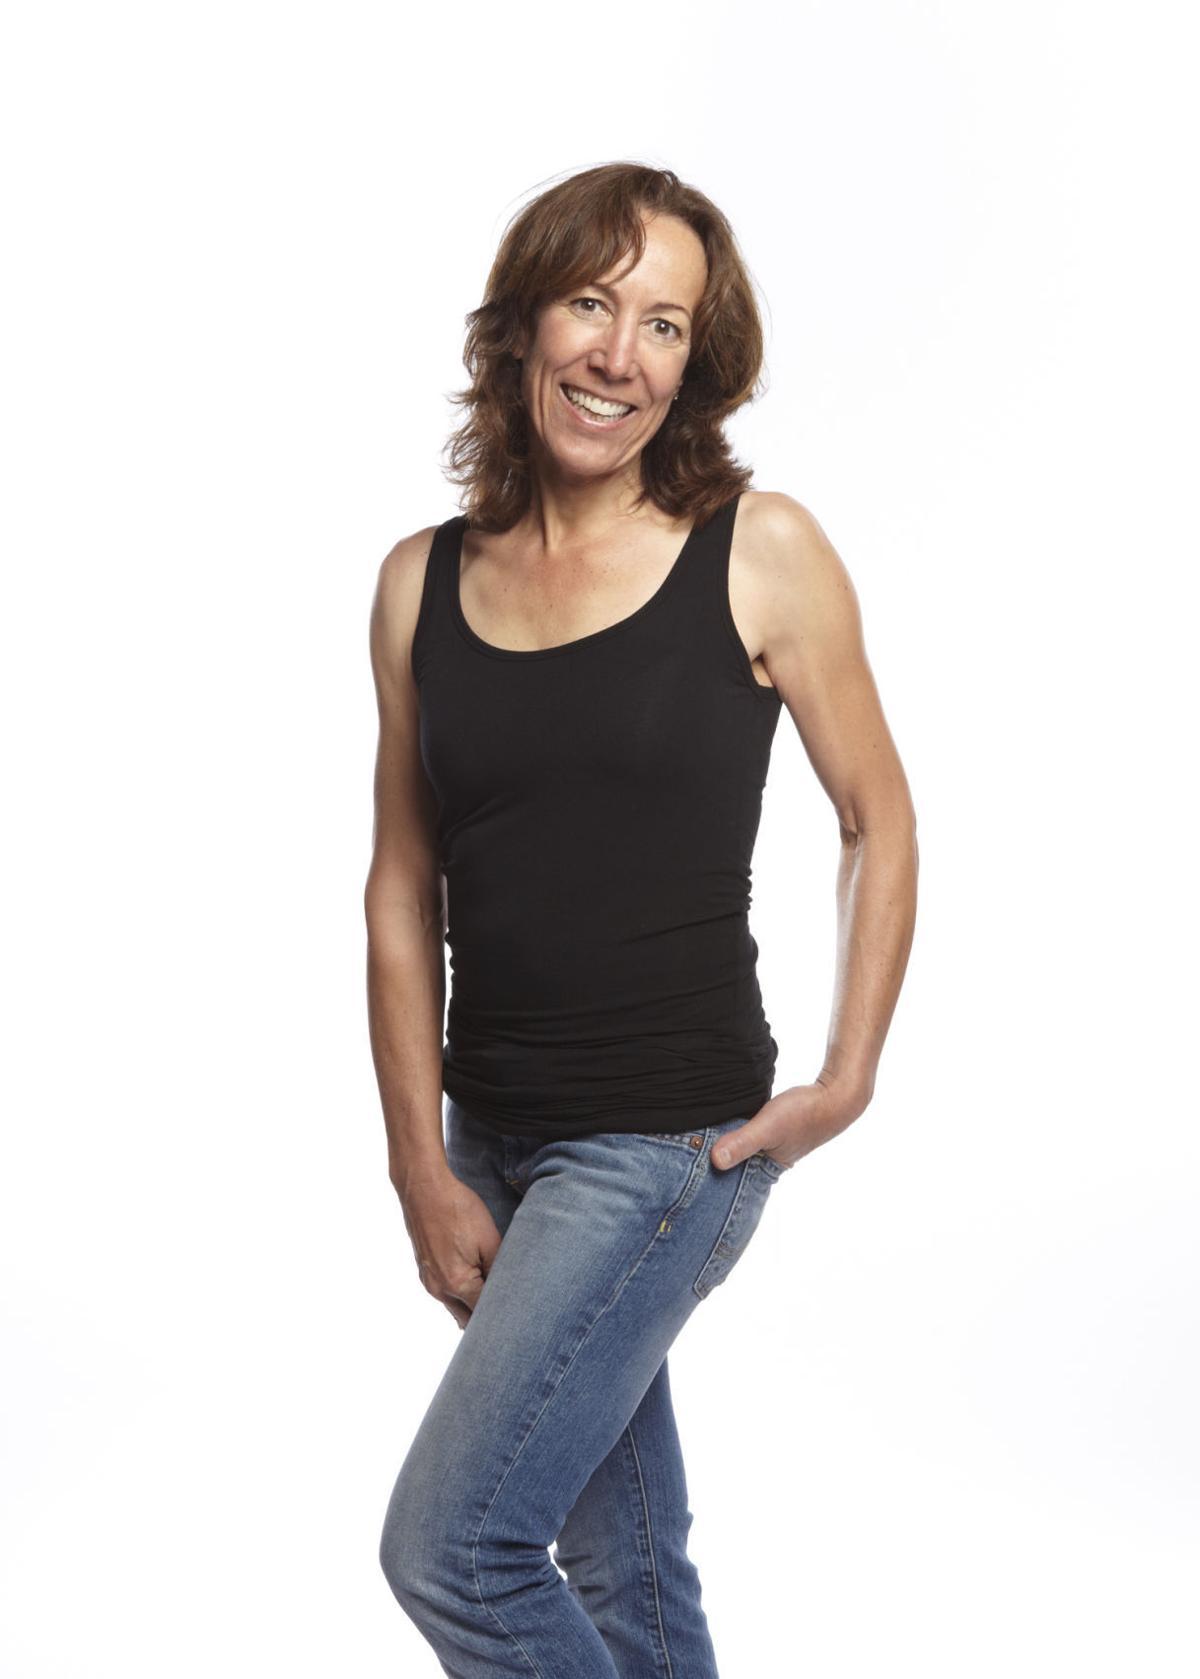 Winemaker Kristin Belair